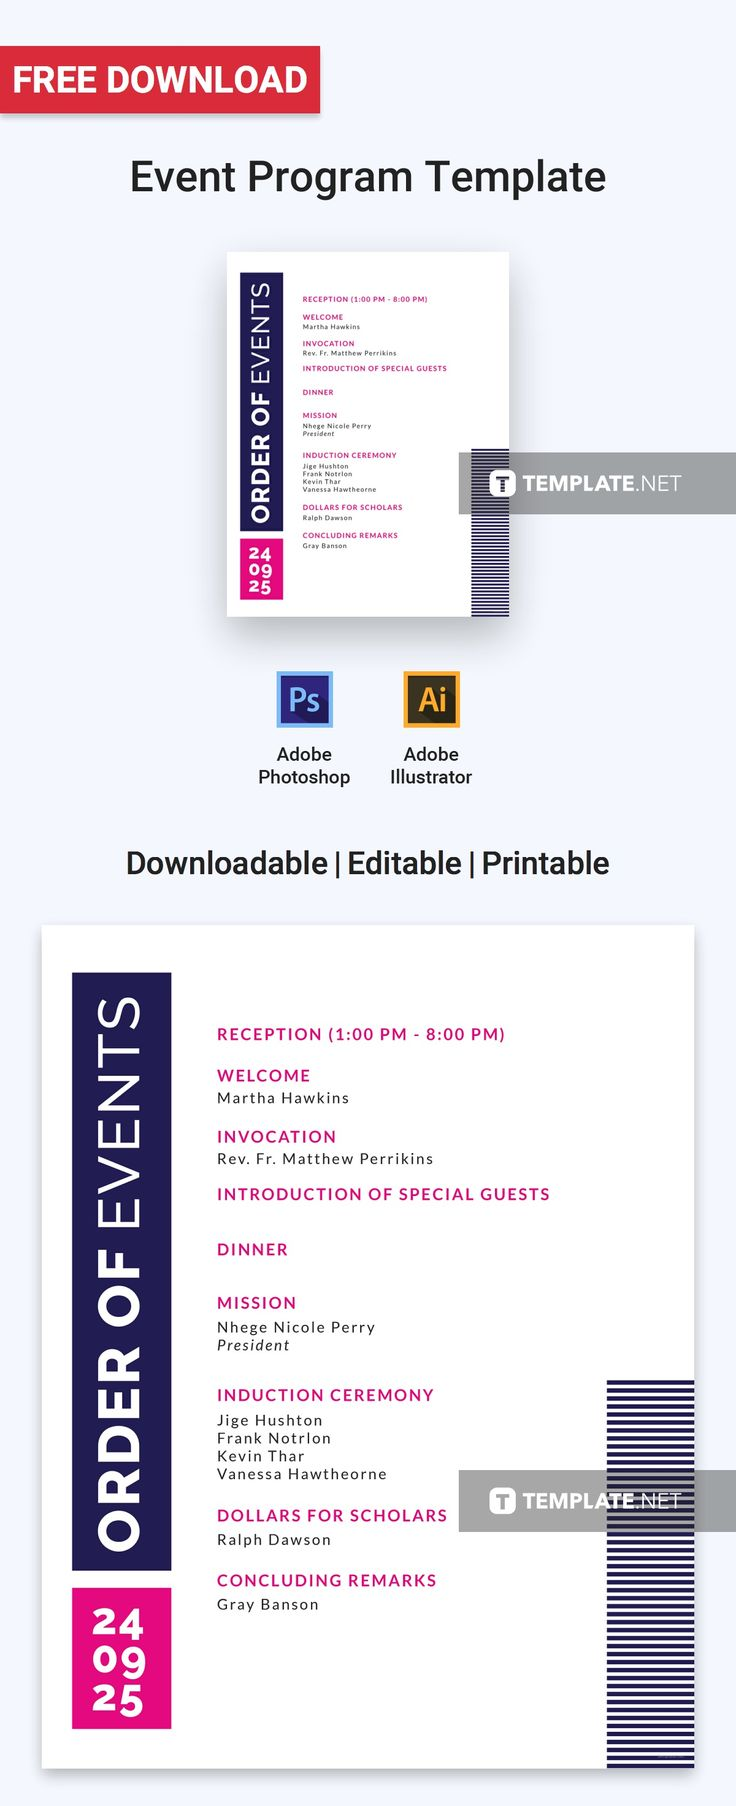 free event program invitation program templates designs 2019 pinterest templates free program templates and program template